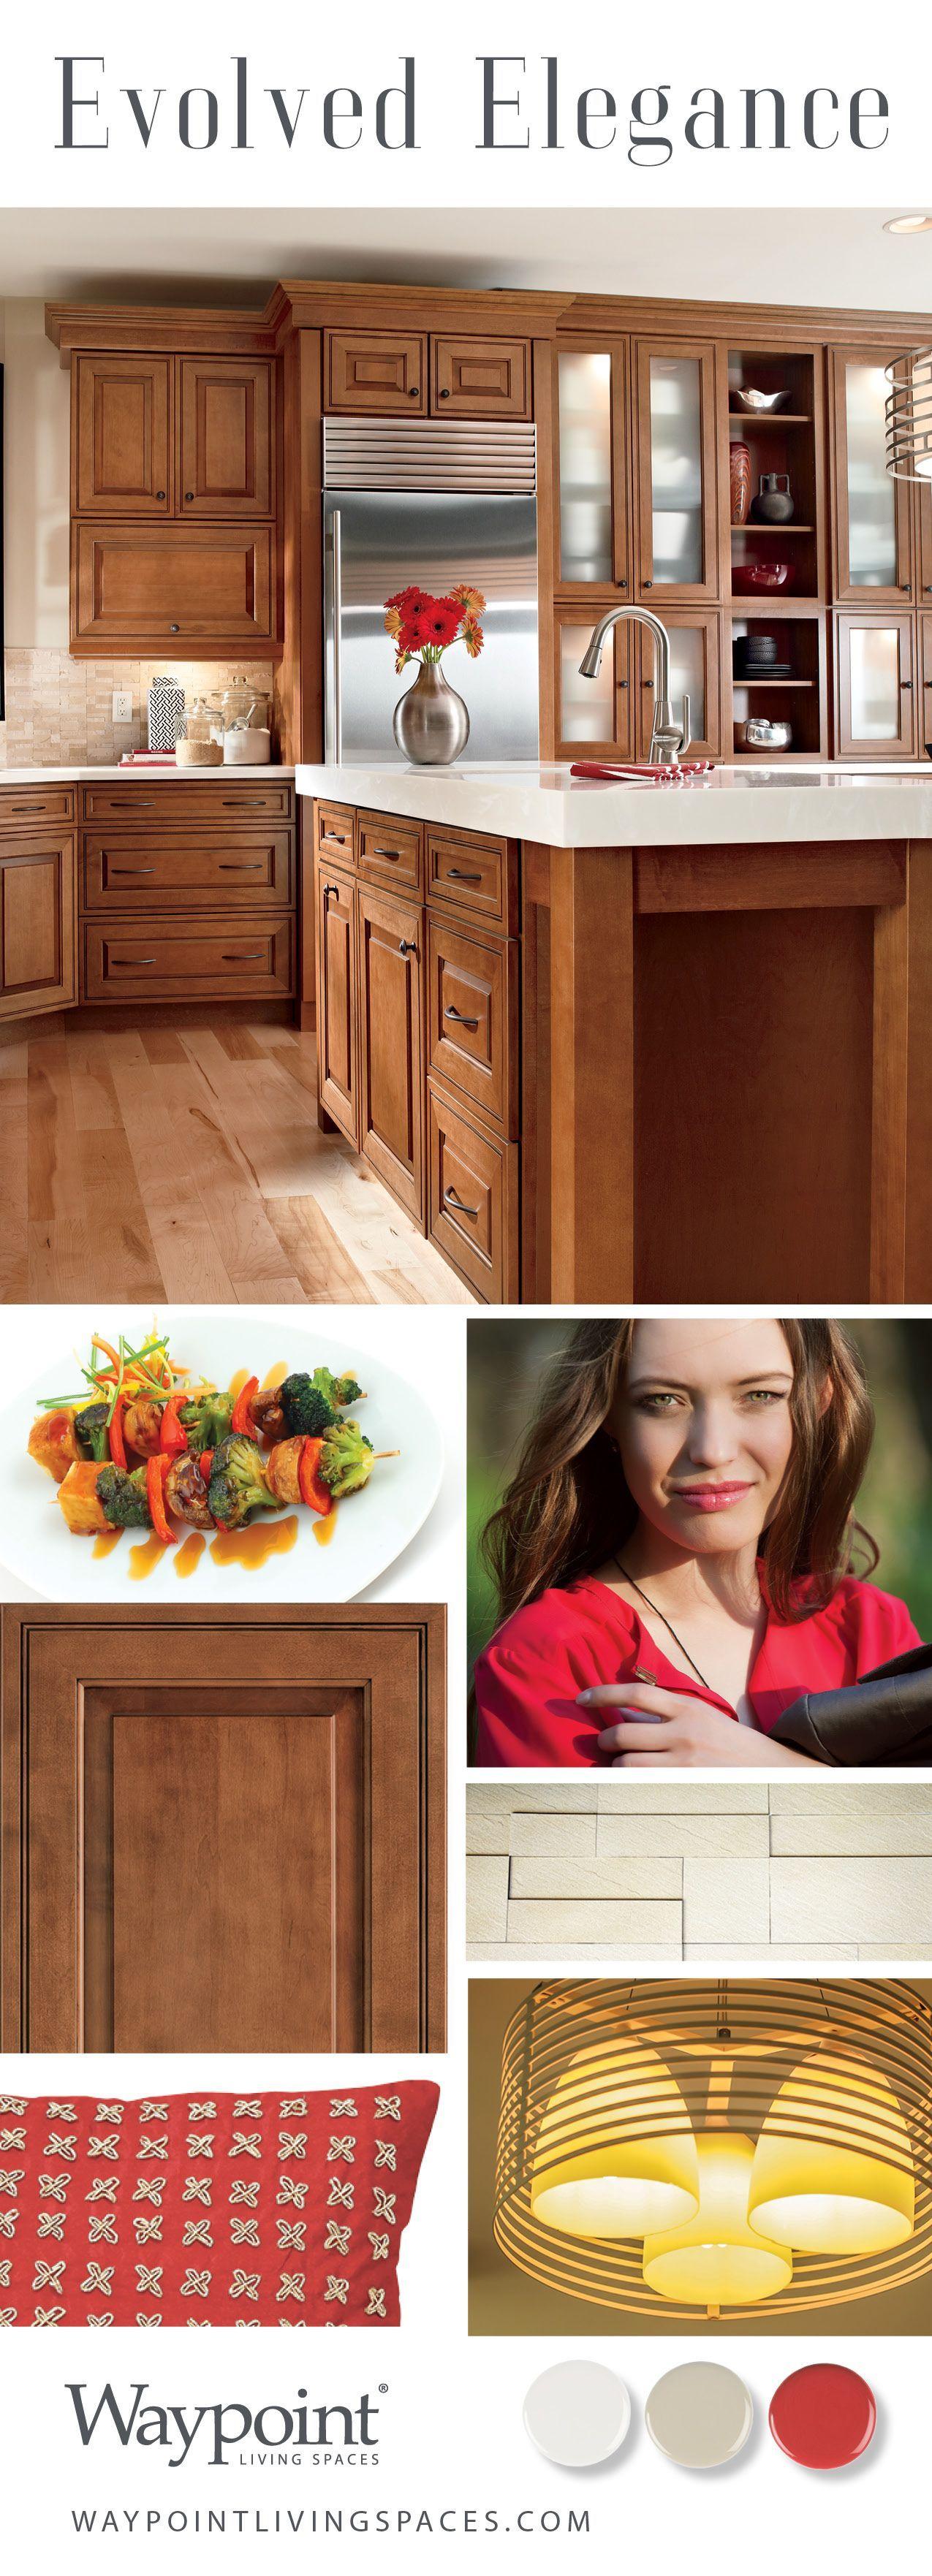 Kitchen cabinets shown with door style maple auburn glaze